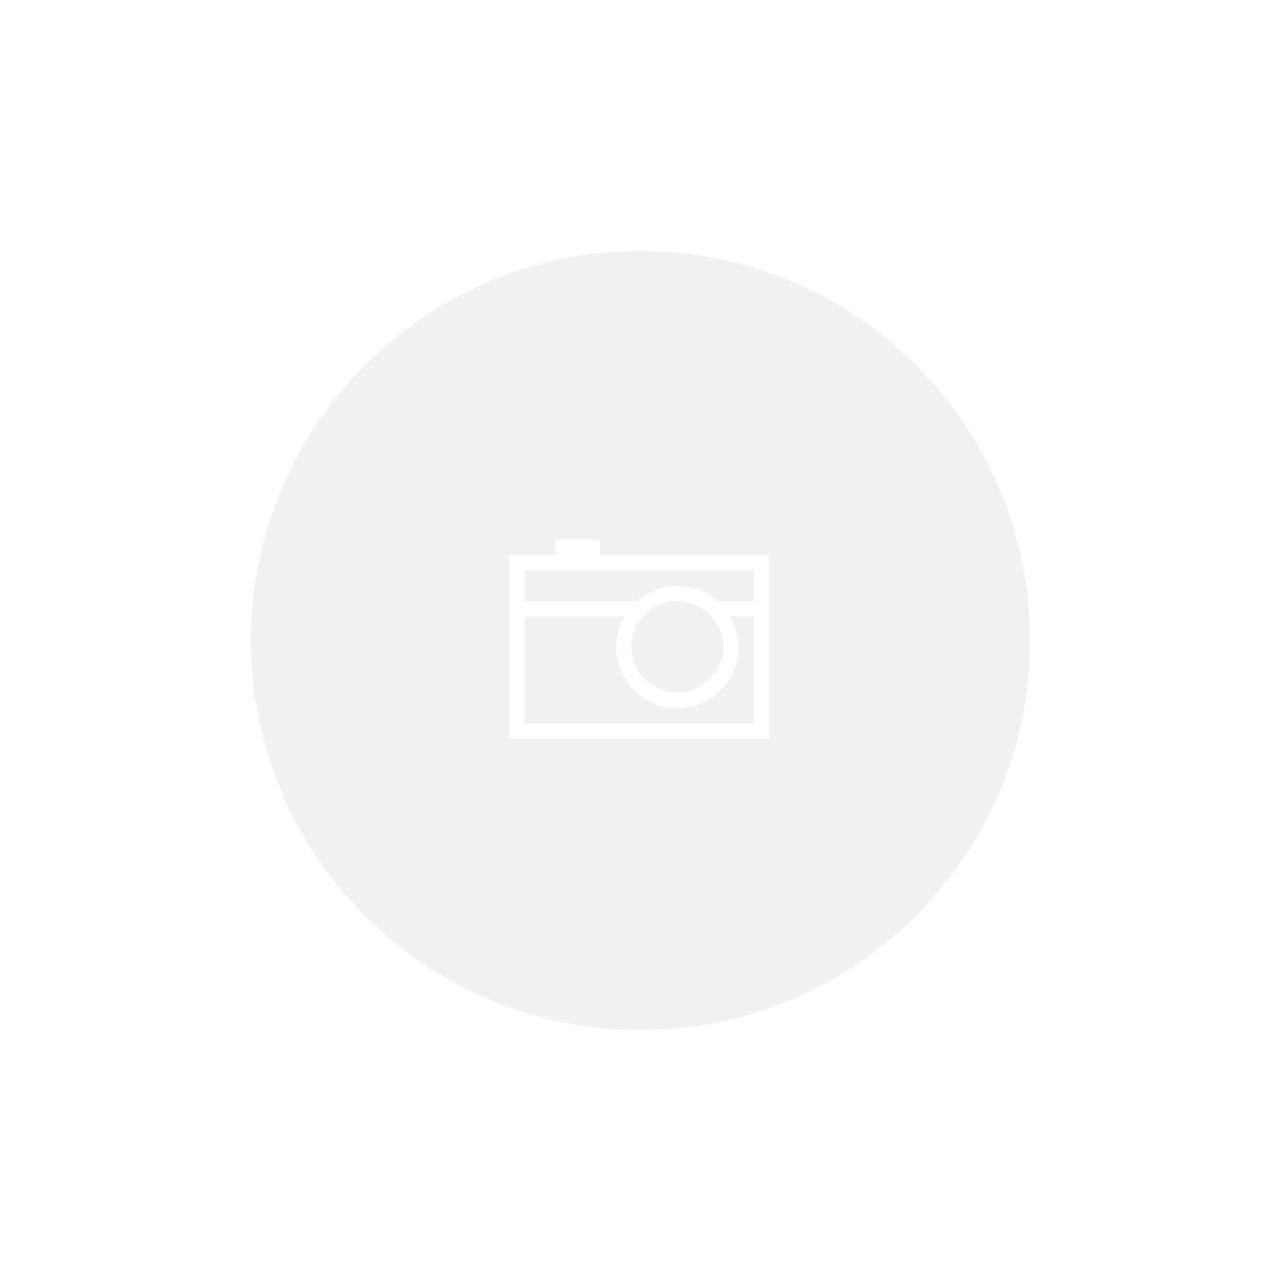 PNEU 26X2.35 CHAOYANG H-5136 GLADIADOR ENDURO/DH